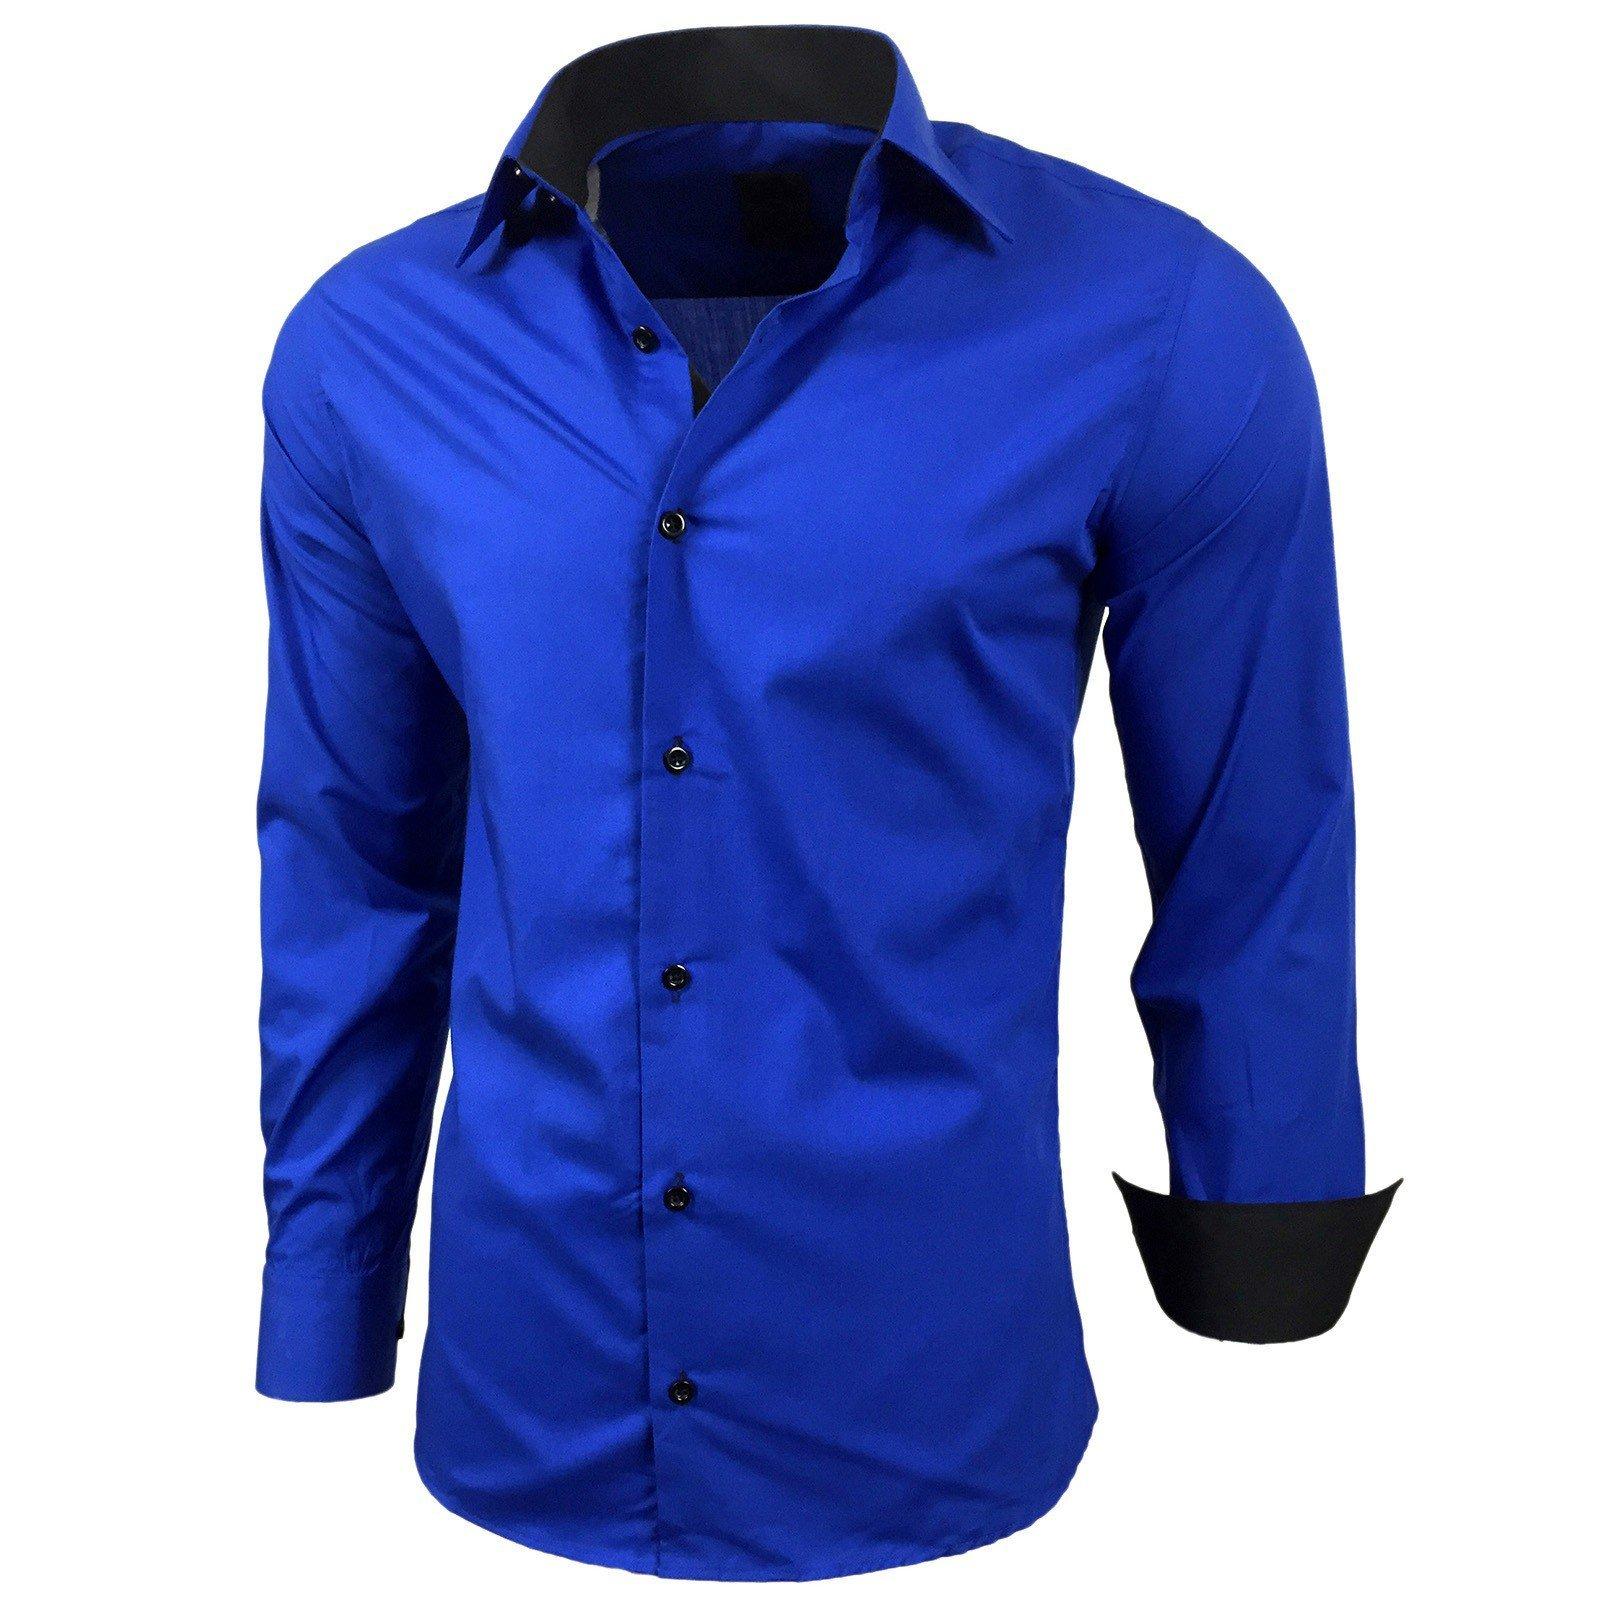 detailed look b76ec 3c899 I piu votati nella categoria Camicie da uomo & recensioni ...